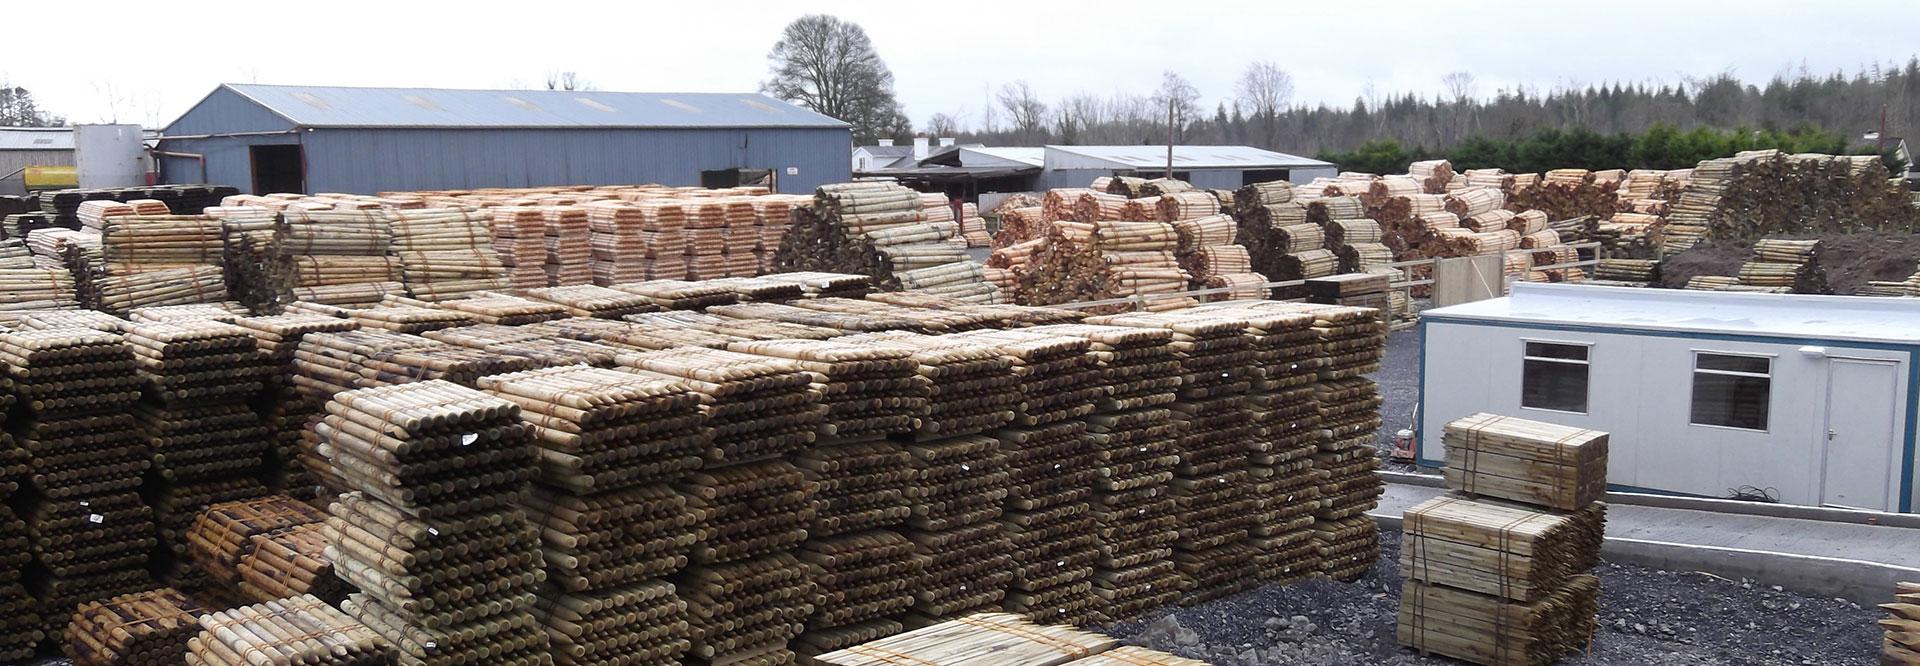 wood farm fence. Big-slider-img Wood Farm Fence